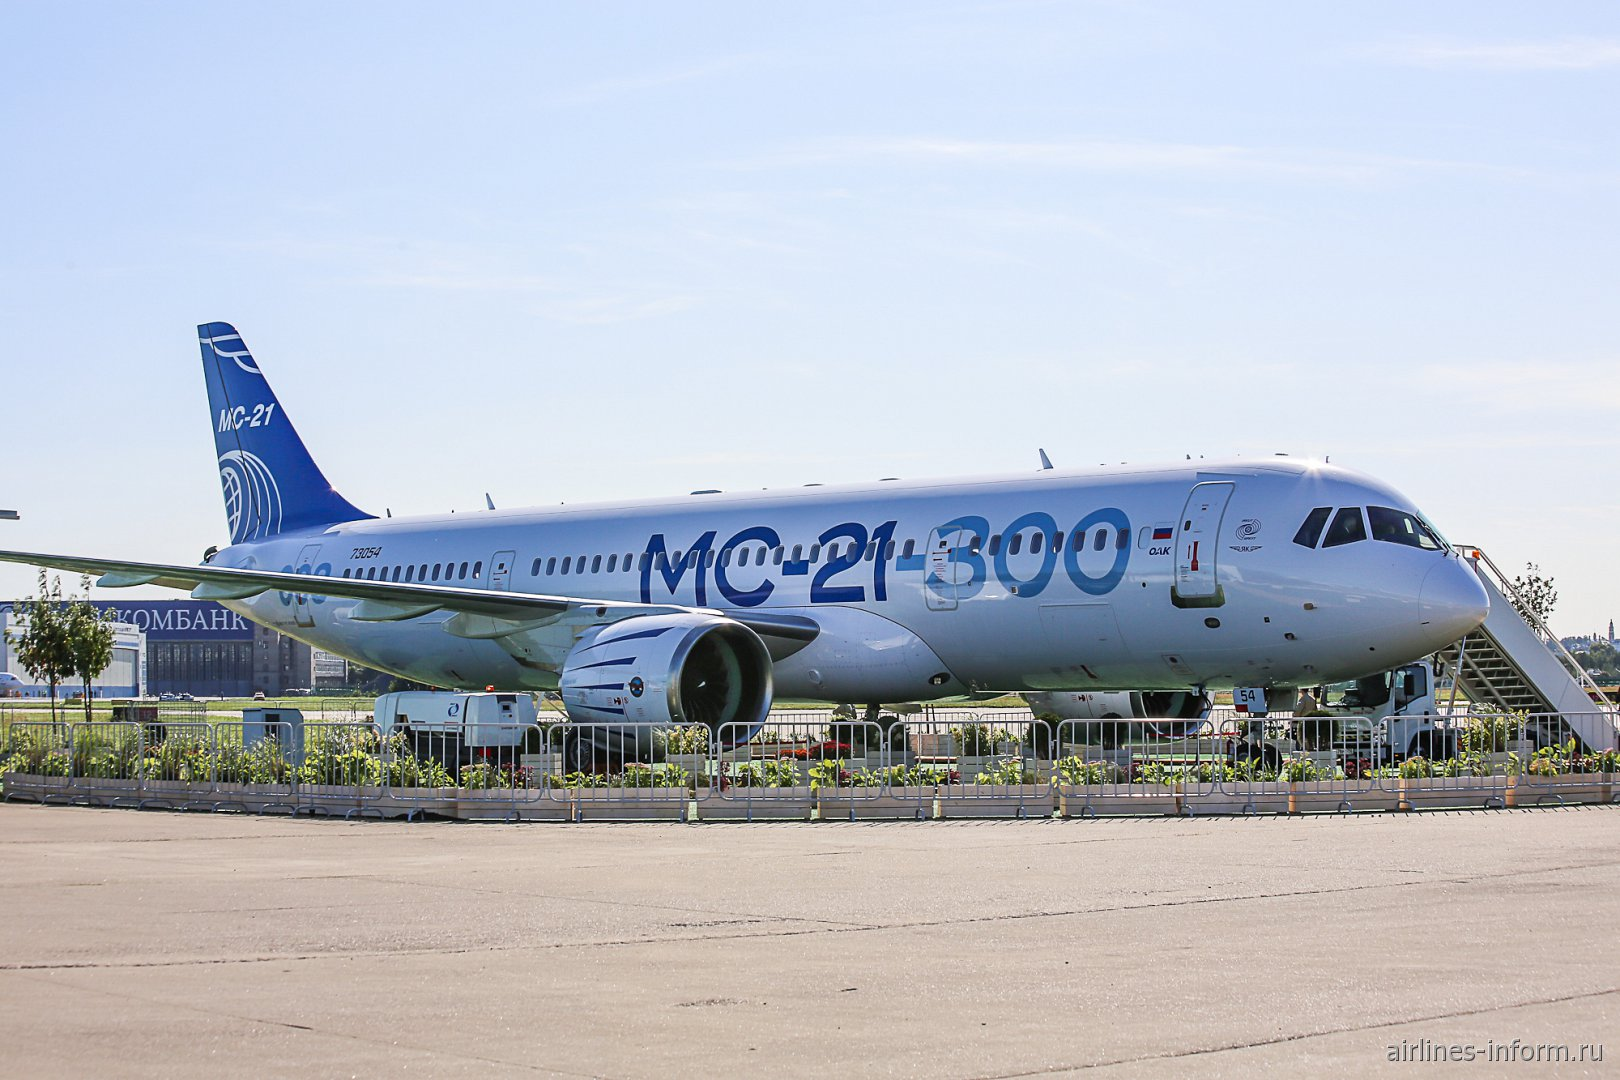 Авиалайнер МС-21-300 на авиасалоне МАКС-2019